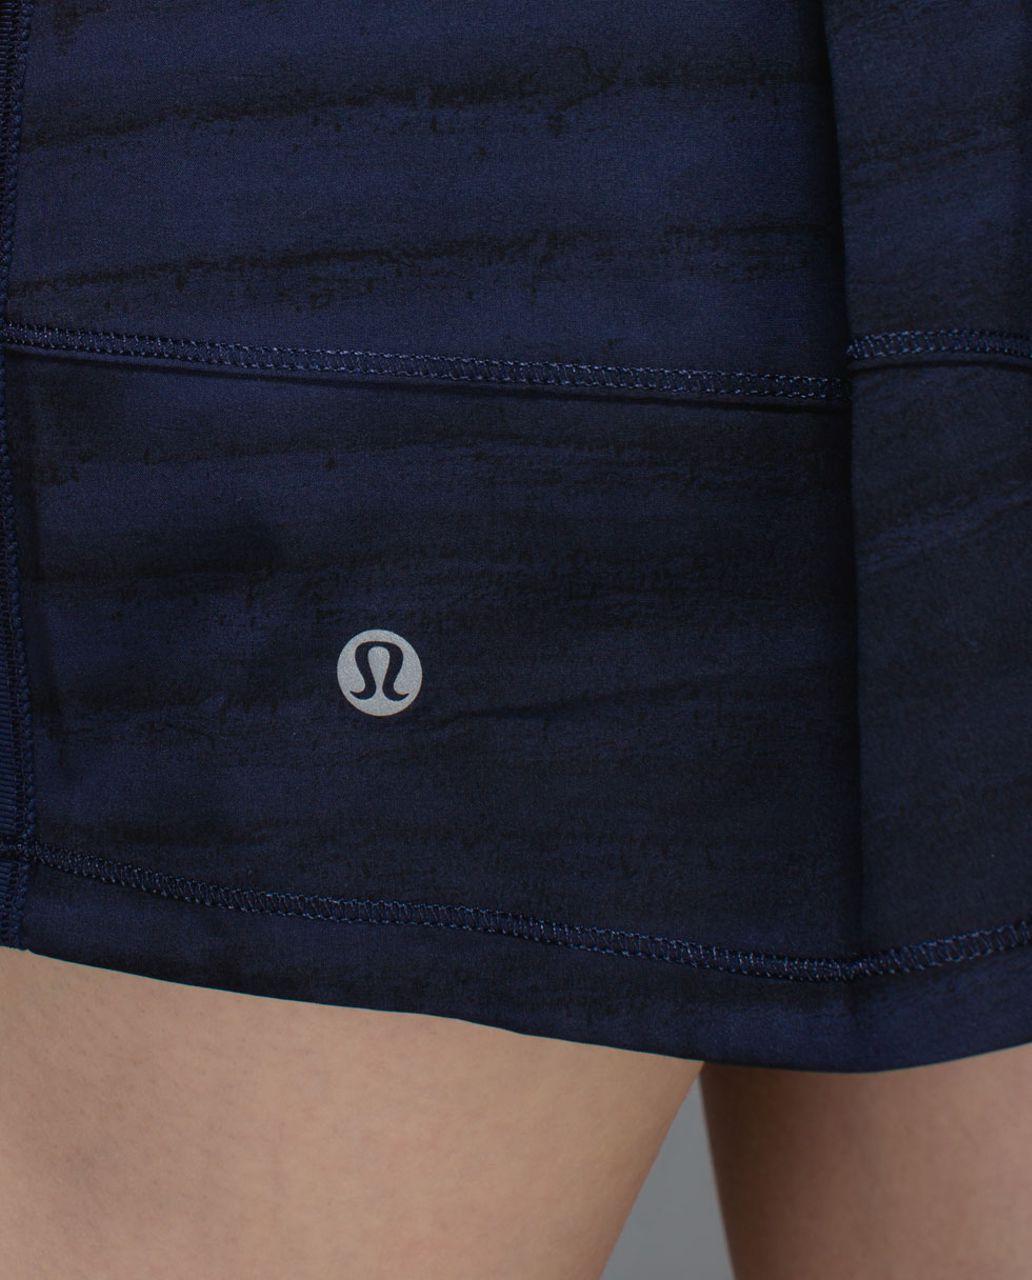 Lululemon Pace Rival Skirt II *4-way Stretch (Tall) - Good Vibes Deep Navy Black / Deep Navy